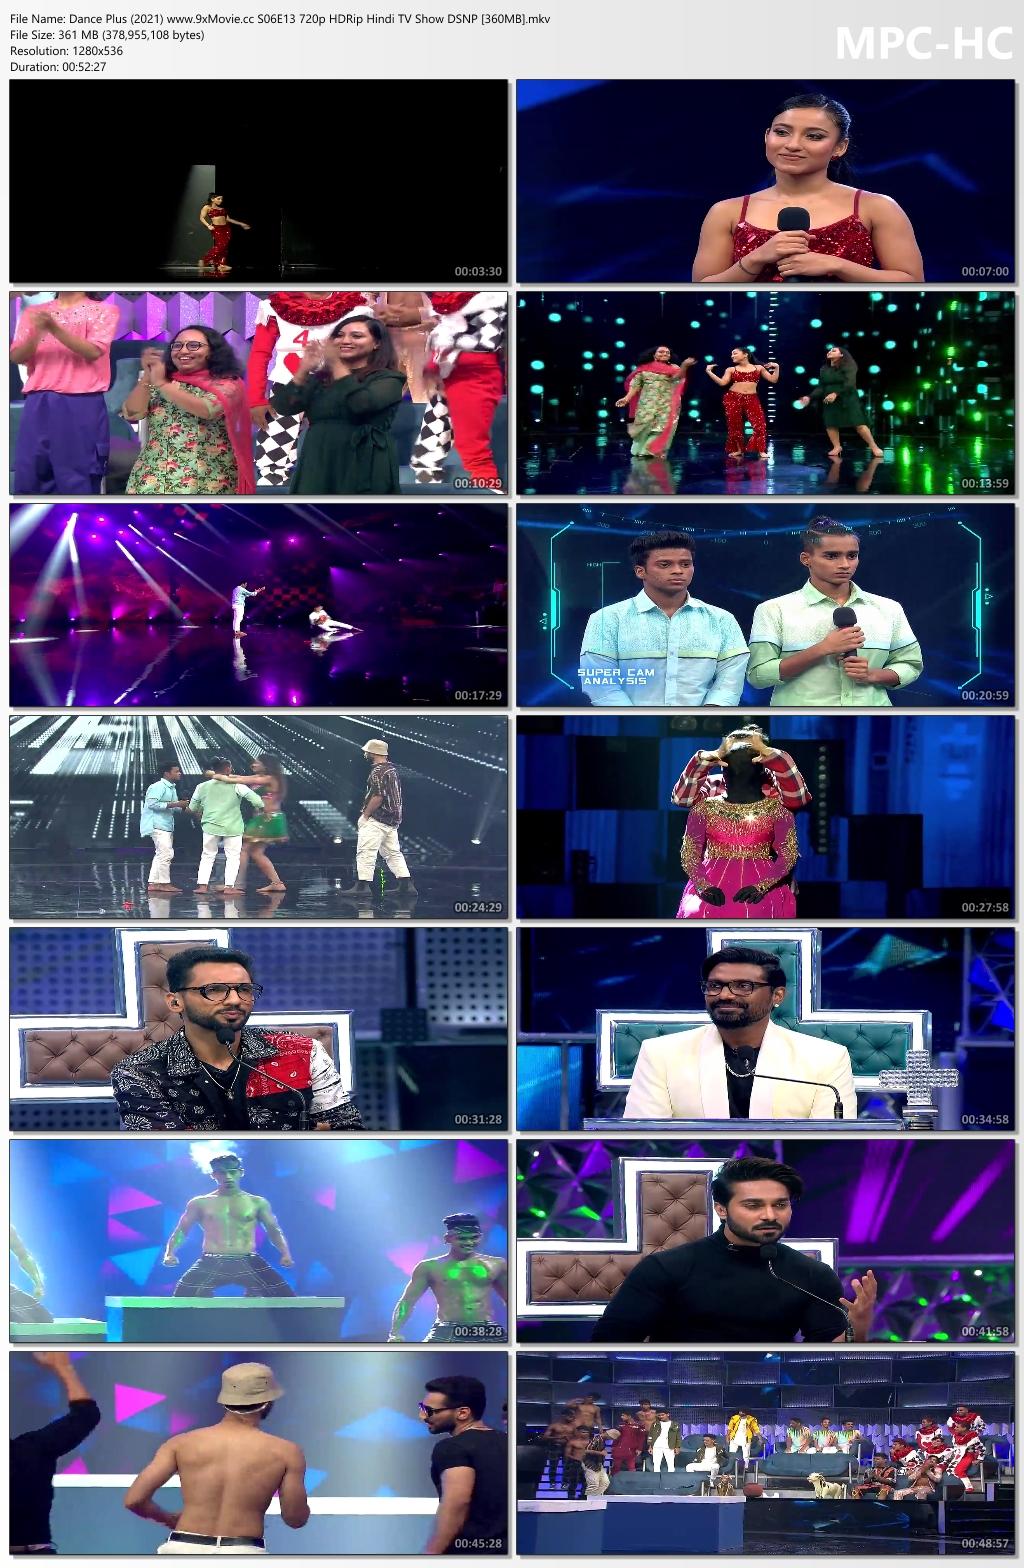 Dance-Plus-2021-www-9x-Movie-cc-S06-E13-720p-HDRip-Hindi-TV-Show-DSNP-360-MB-mkv